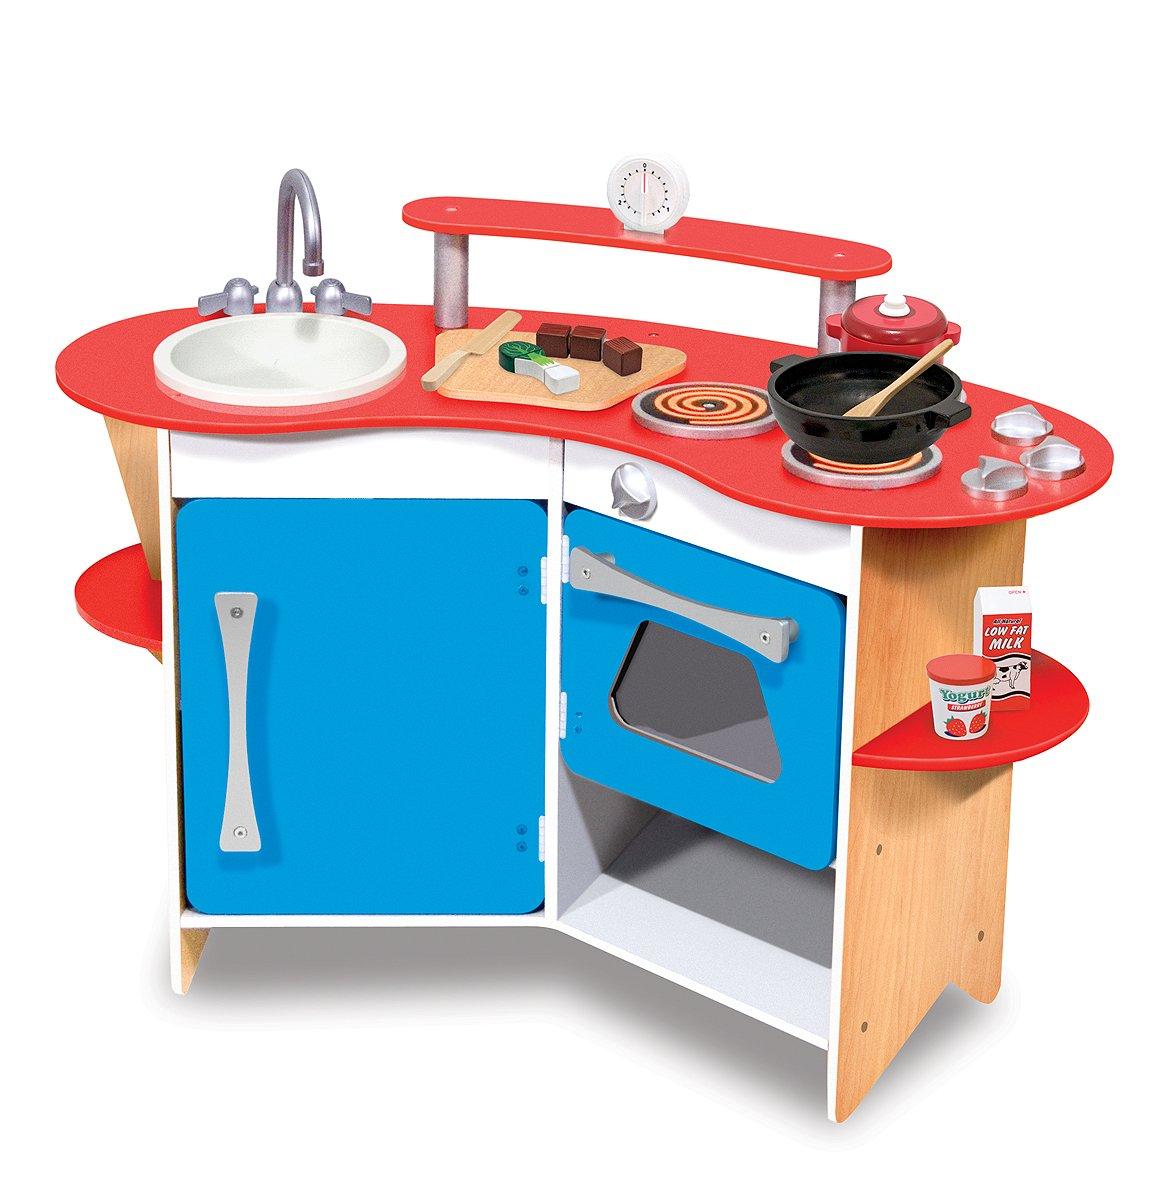 Melissa & Doug 13950 Cooks Corner Wooden Kitchen: Amazon.co.uk: Toys ...